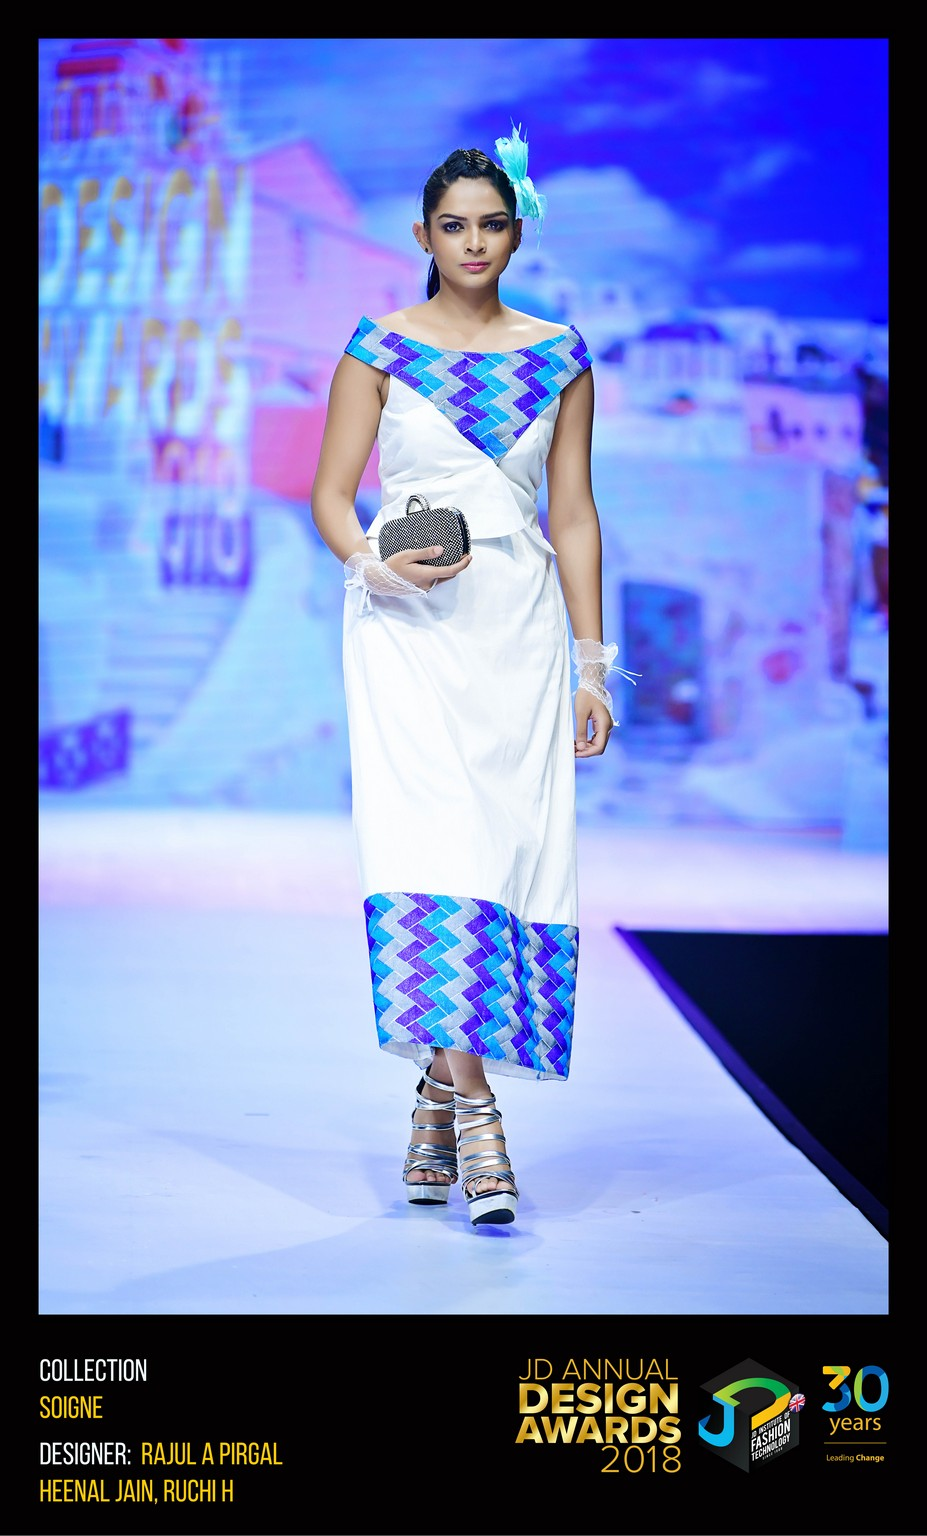 Soigne – Change – JD Annual Design Awards 2018 | Designer: Rajul, Heena and Ruchi | Photography : Jerin Nath (@jerin_nath) soigne – change – jd annual design awards 2018 Soigne – Change – JD Annual Design Awards 2018 SOIGNE 3